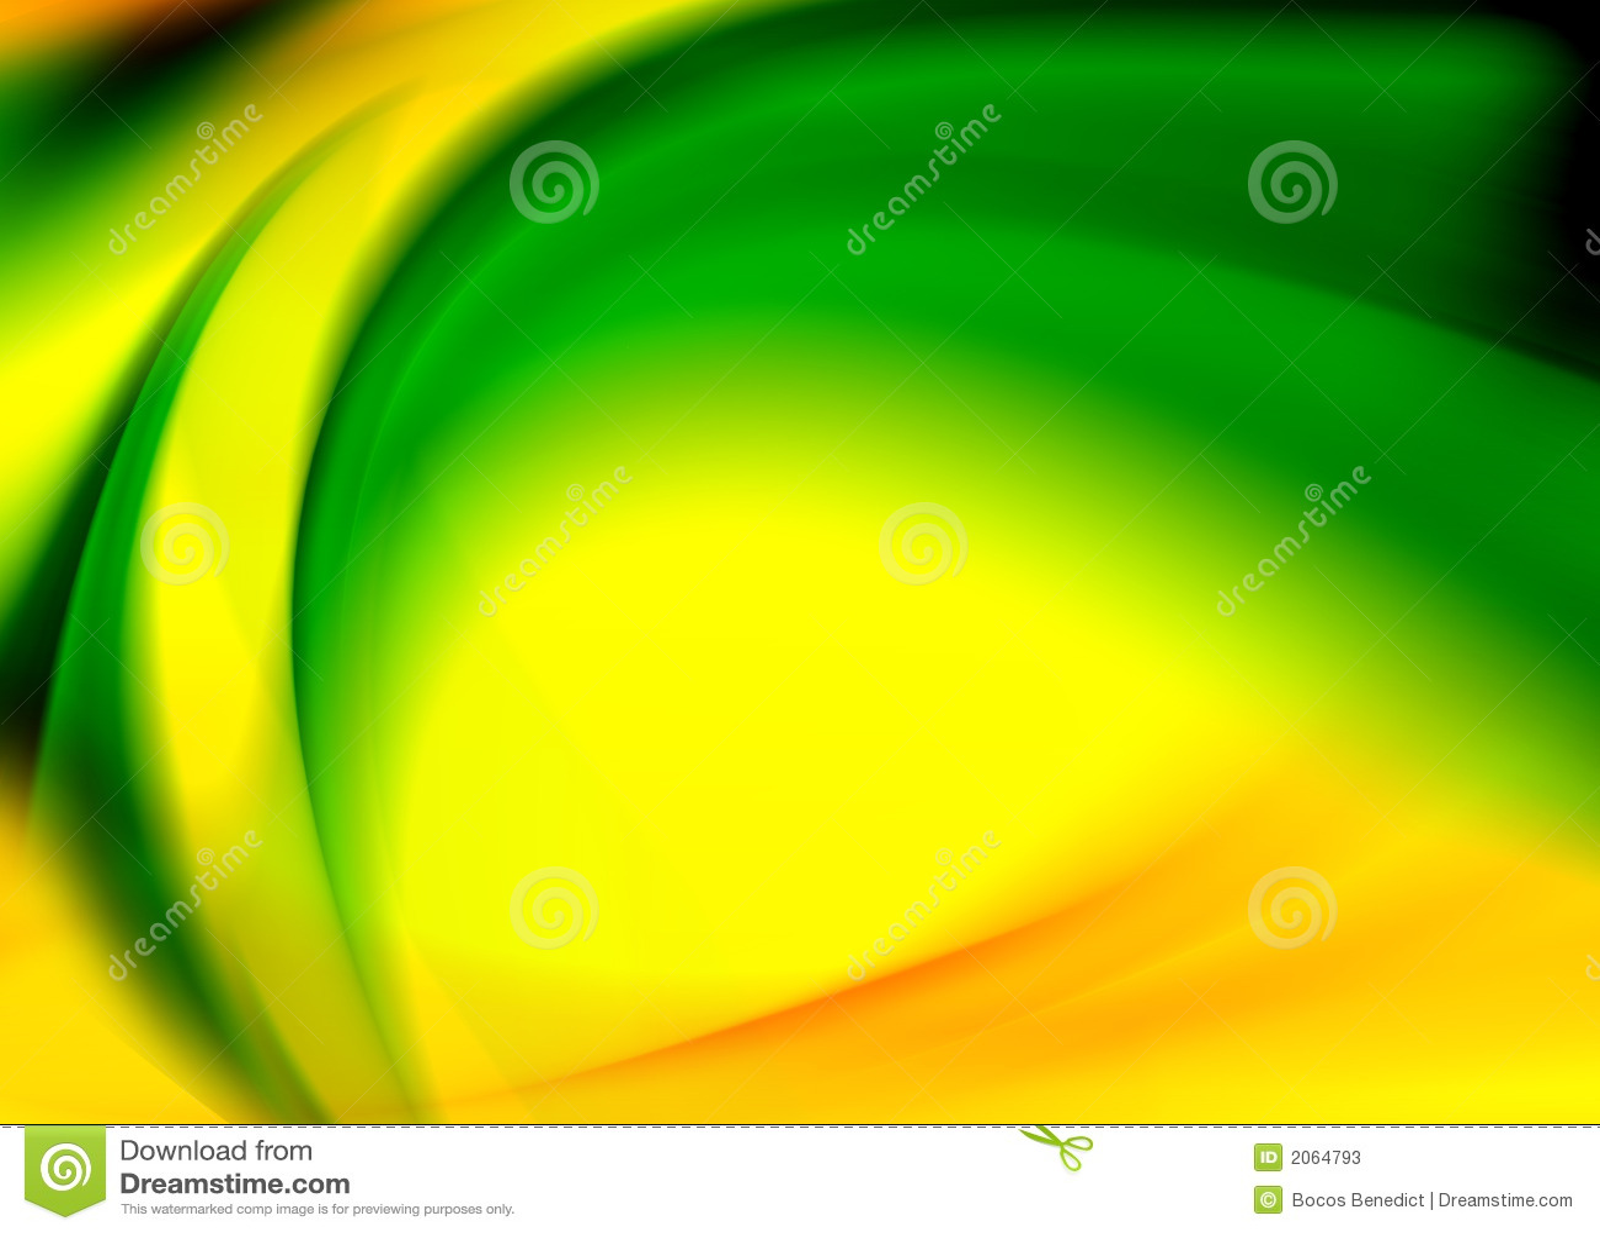 abstract yellow green drawing - photo #18